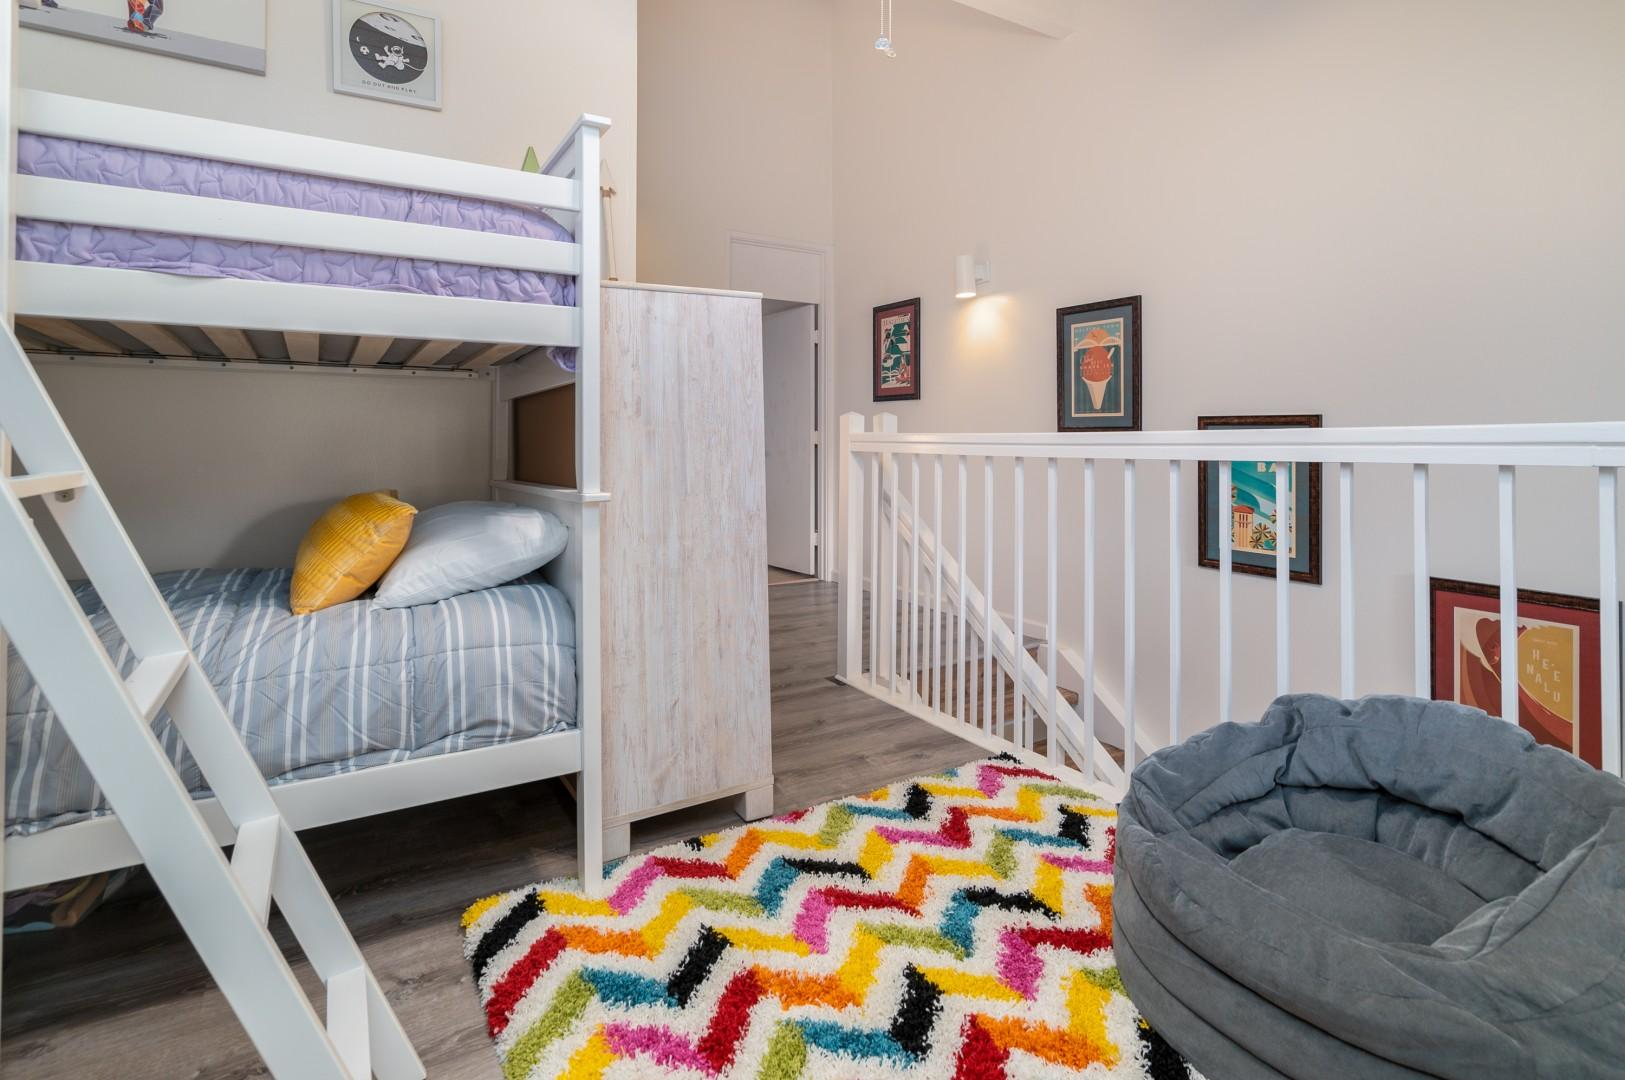 Additional sleeping option in the loft